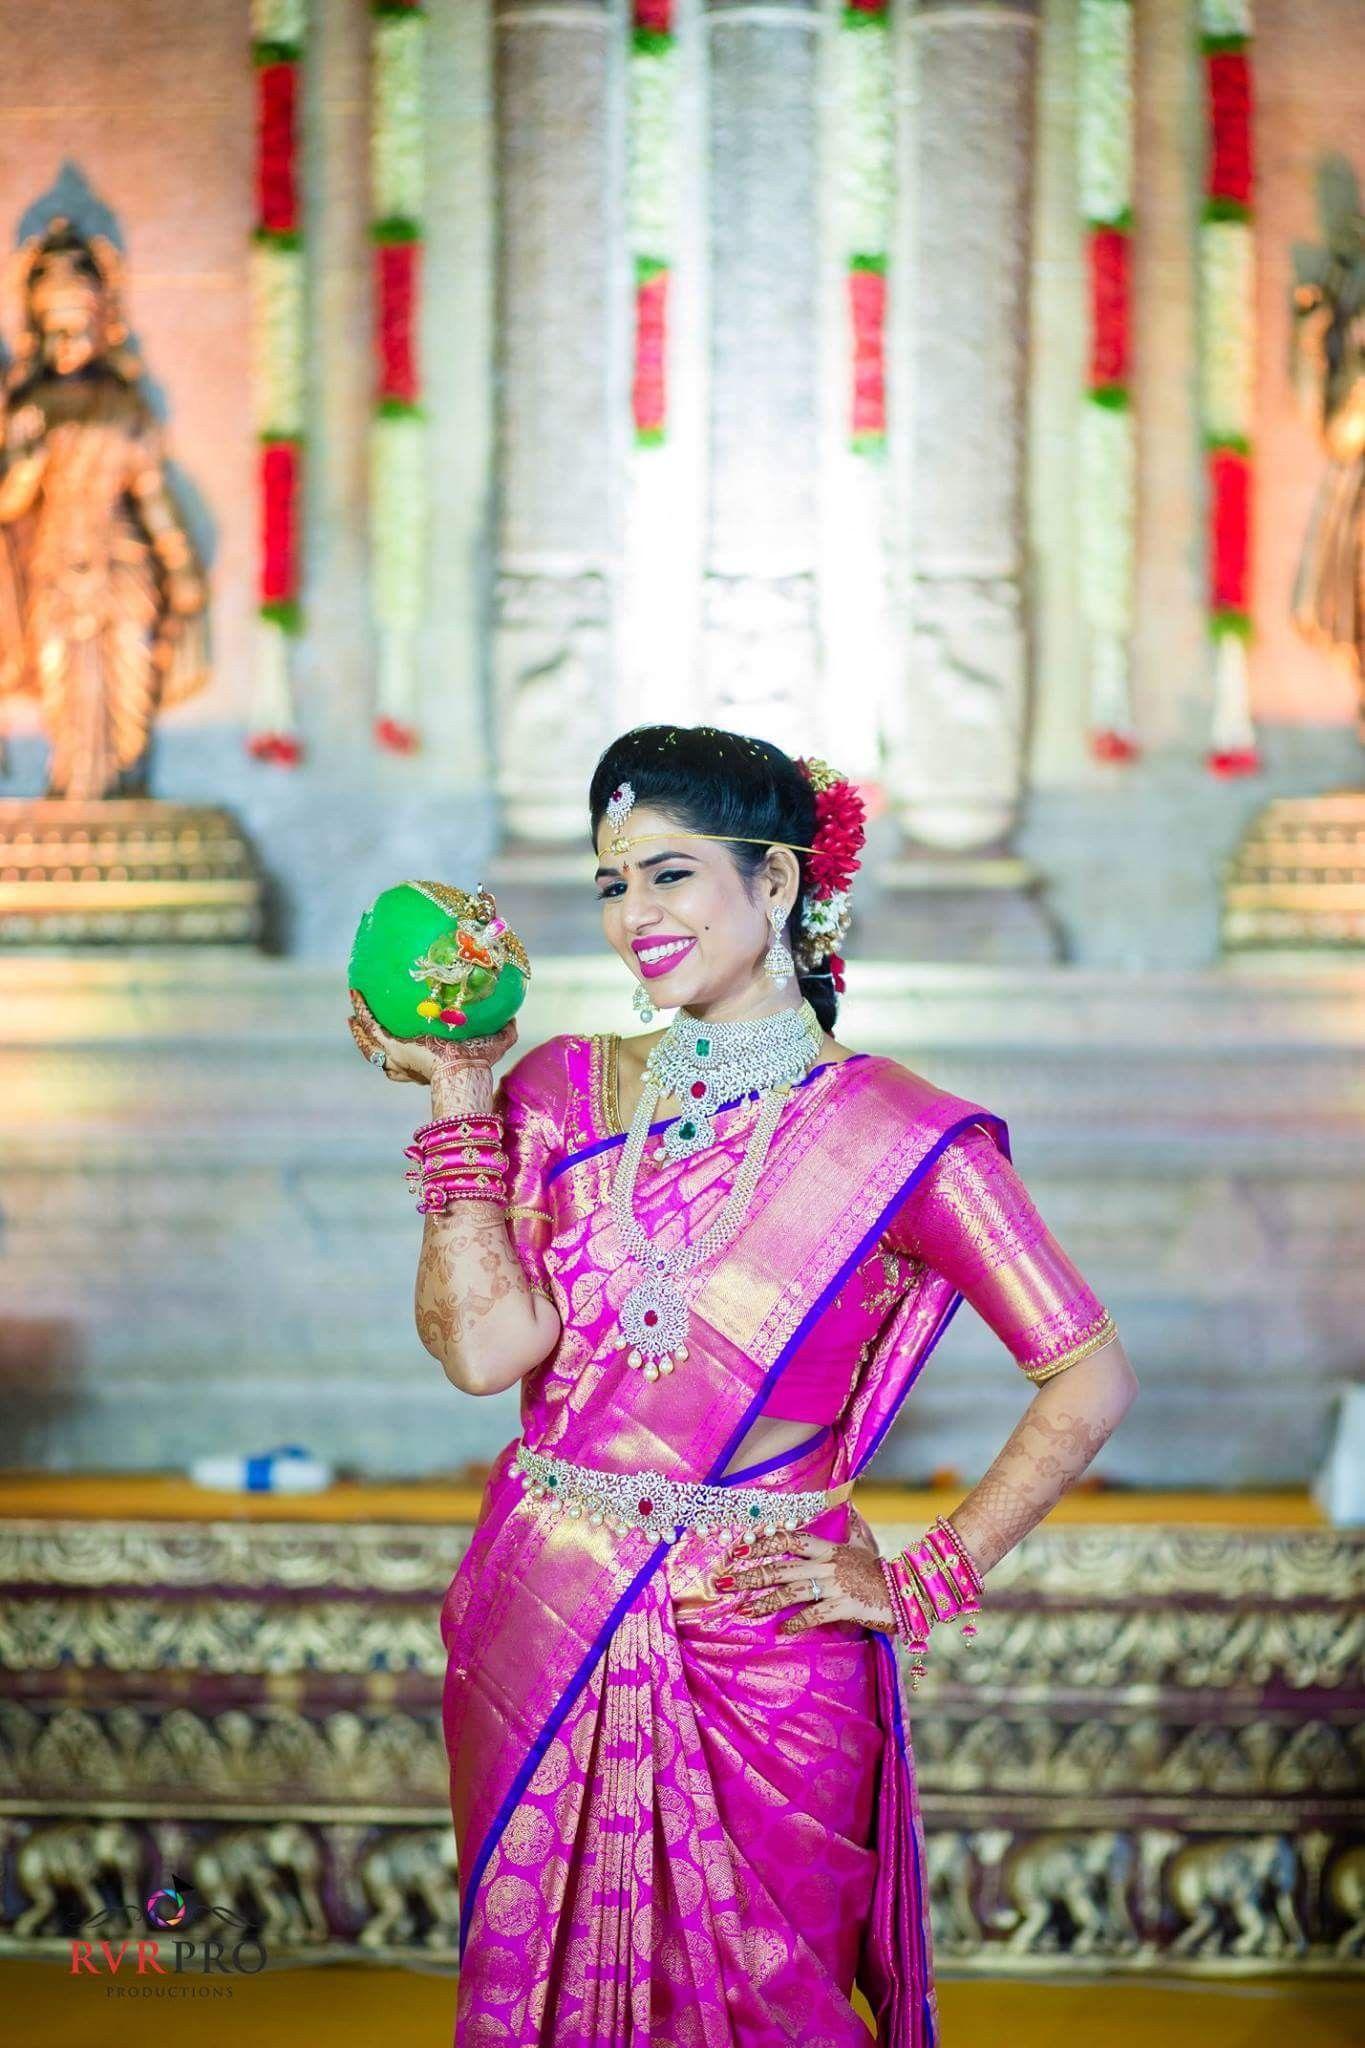 Pin de Haritha Veerapaneni en haritha interests   Pinterest